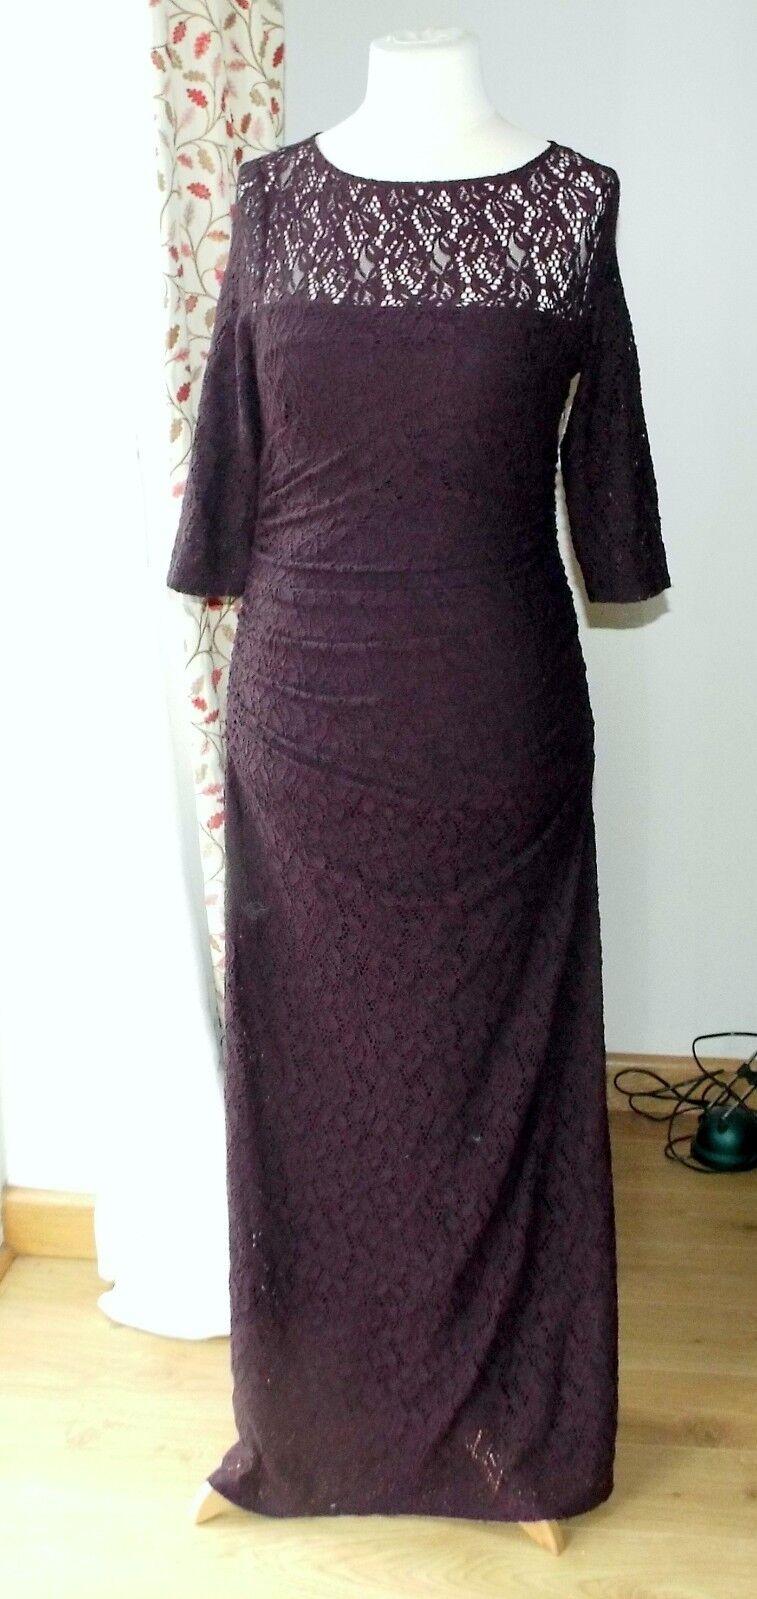 BNWT Phase Eight Angelina aubergine lace dress Größe 14